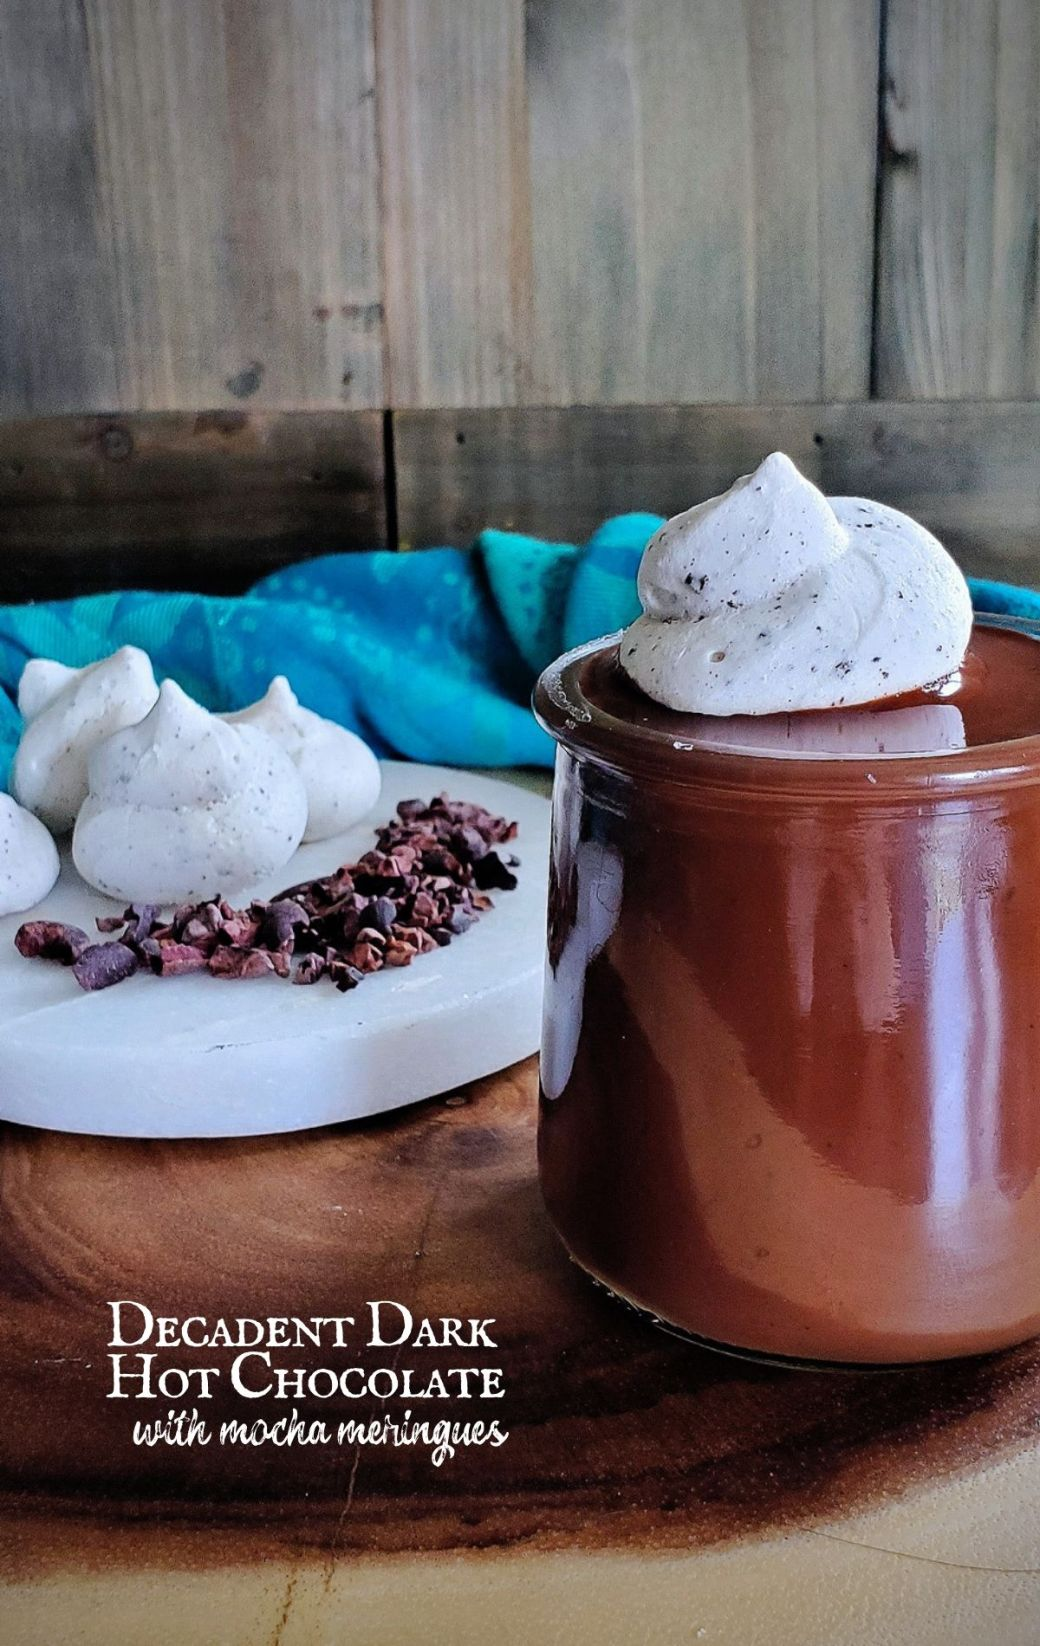 Decadent Dark Hot Chocolate with Coconut Milk